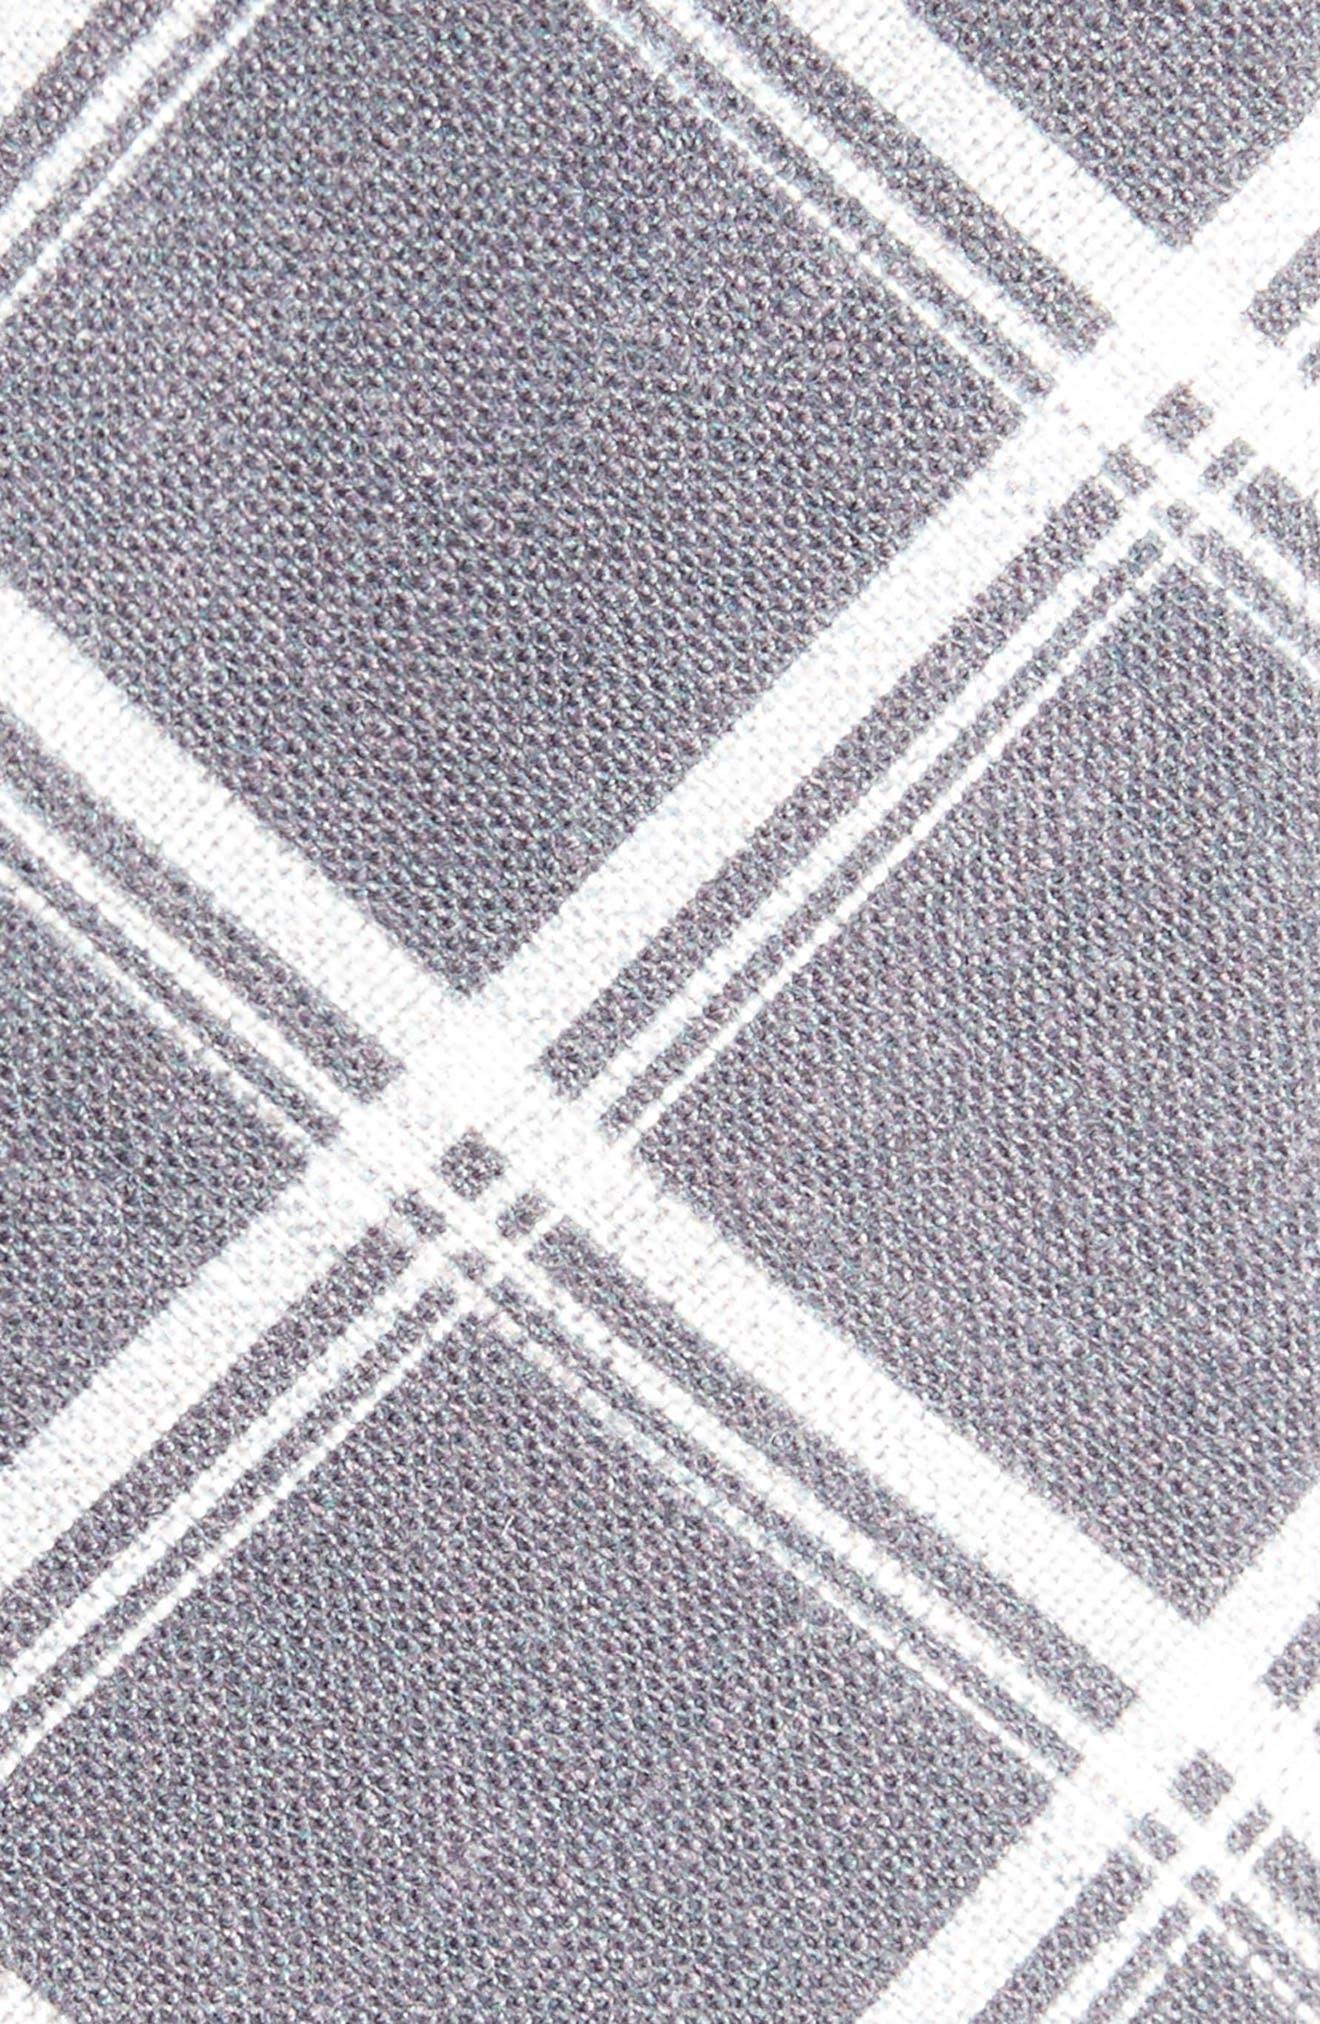 Jet Plaid Linen Skinny Tie,                             Alternate thumbnail 3, color,